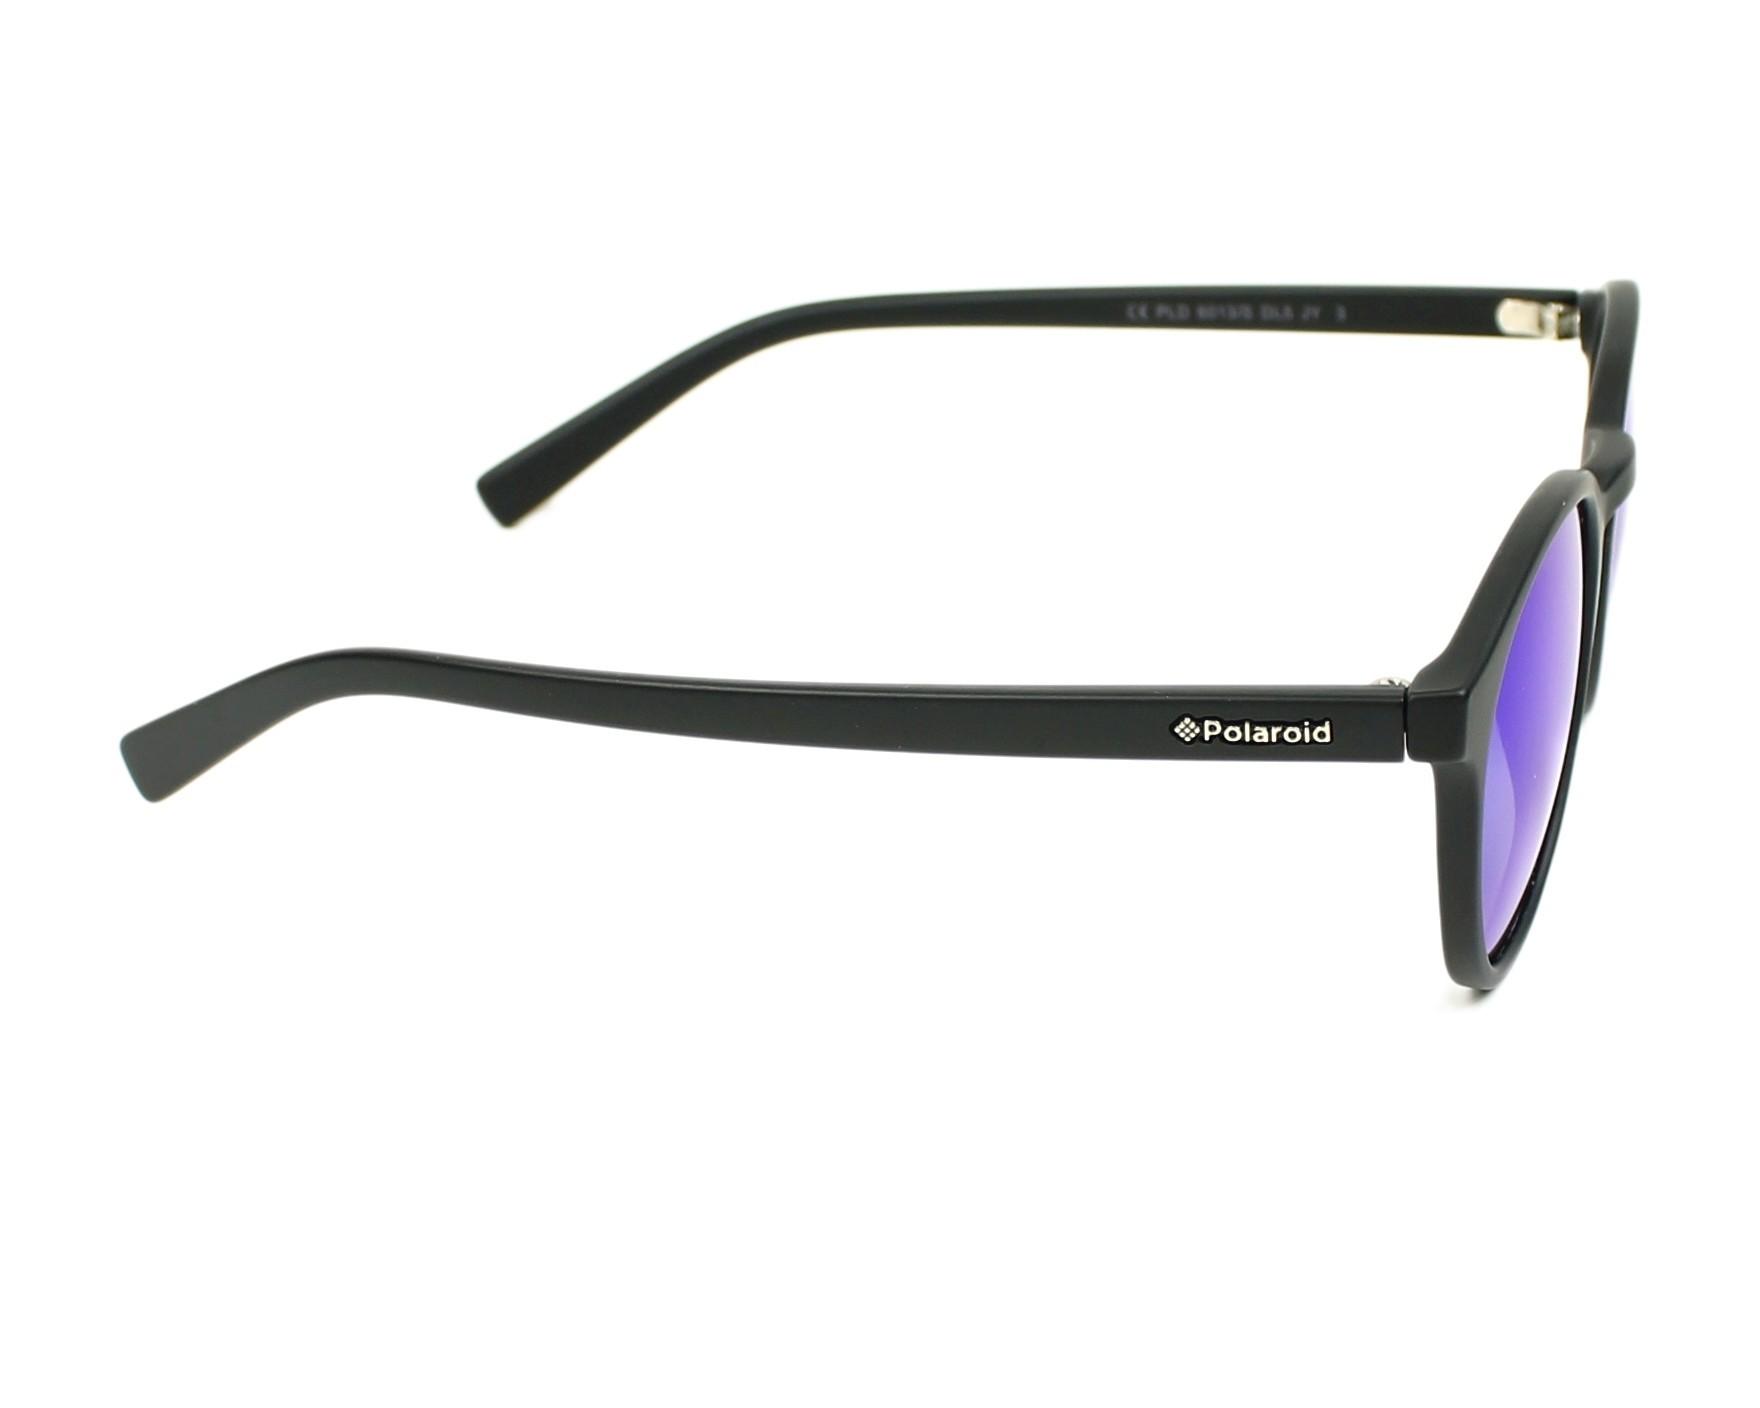 4310163a5adc Sunglasses Polaroid PLD-6013-S DL5 JY 50-22 Black side view